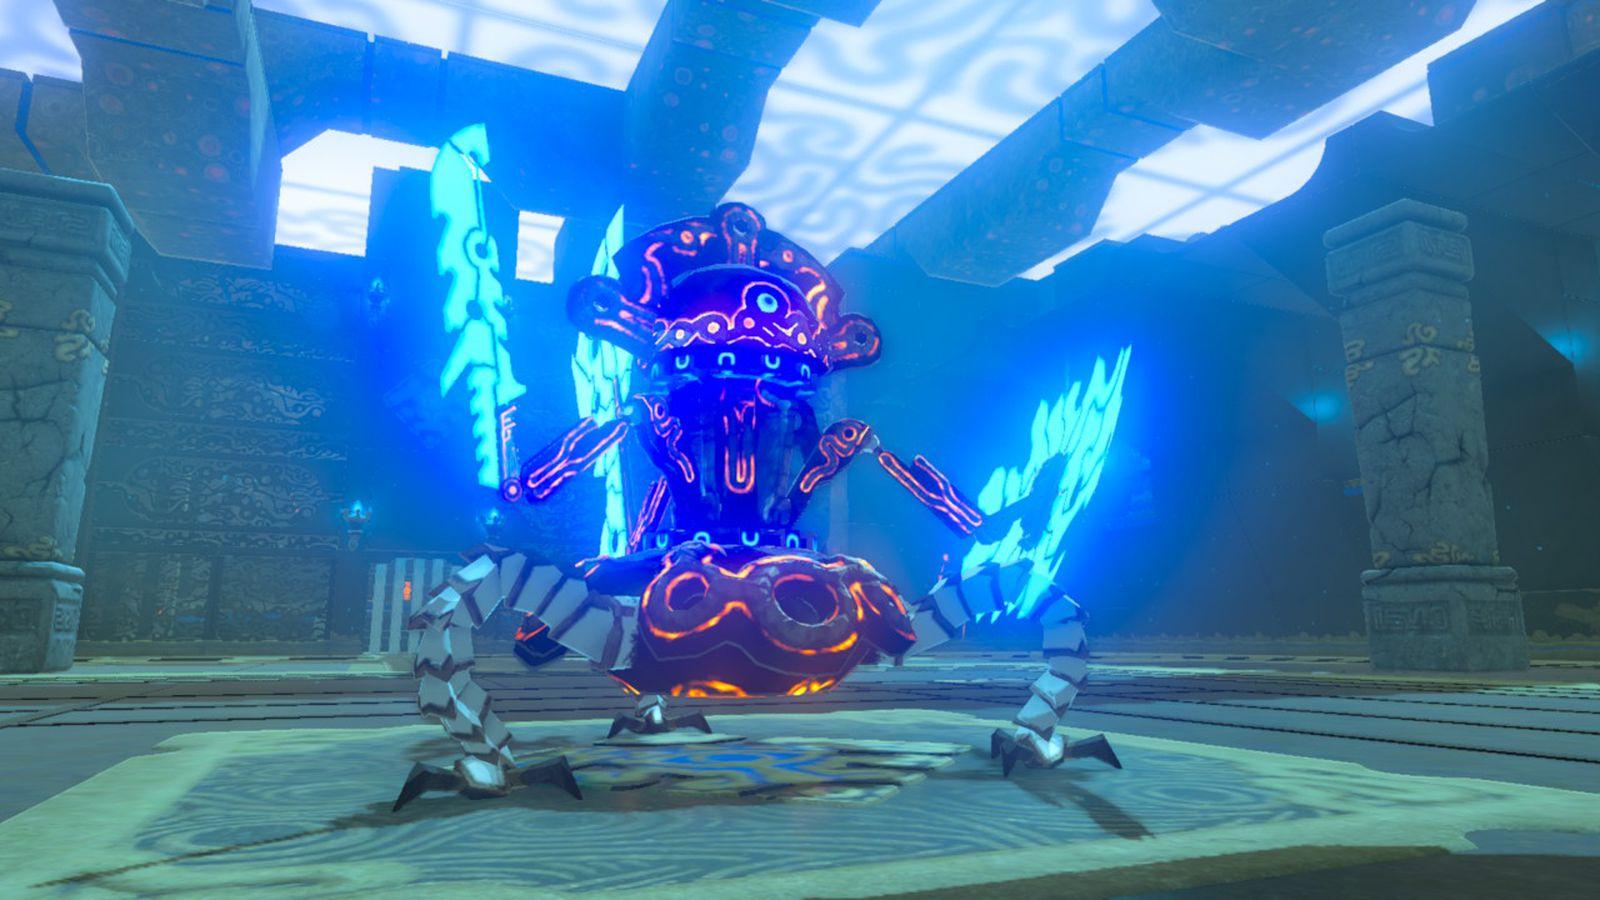 Zelda: Breath of the Wild guide: Tena Ko'sah shrine location